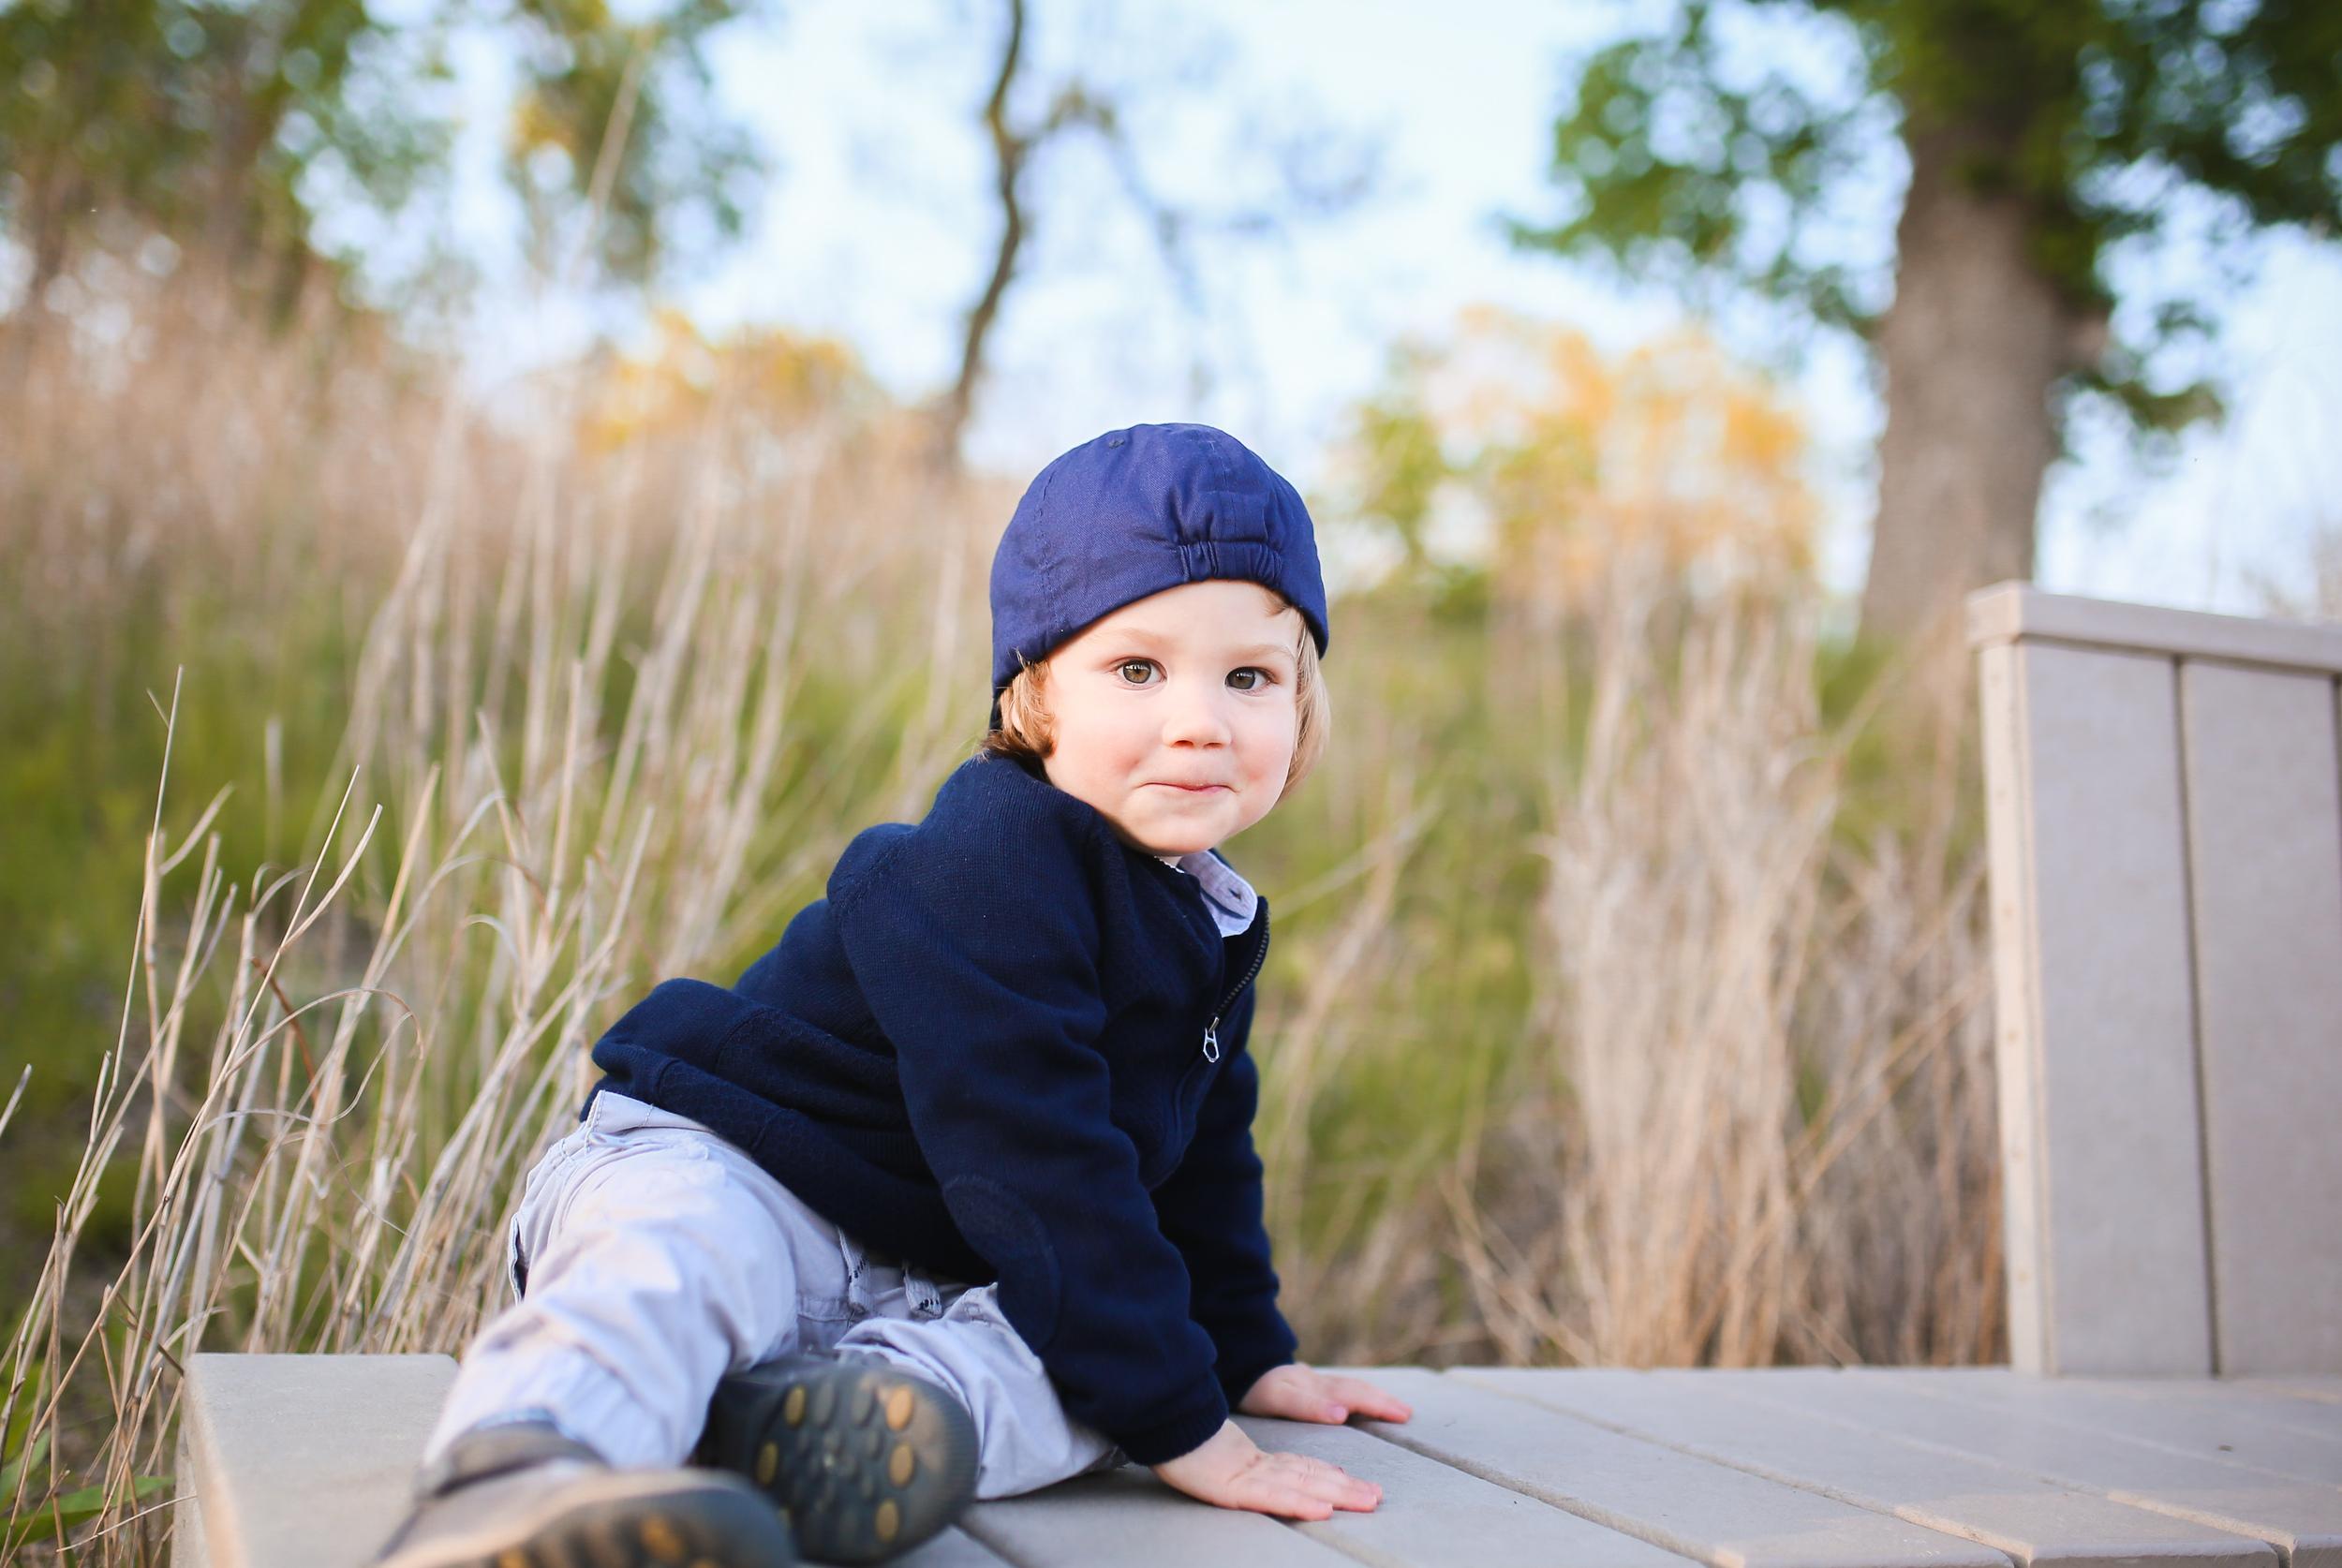 toddler boy with backwards ball cap